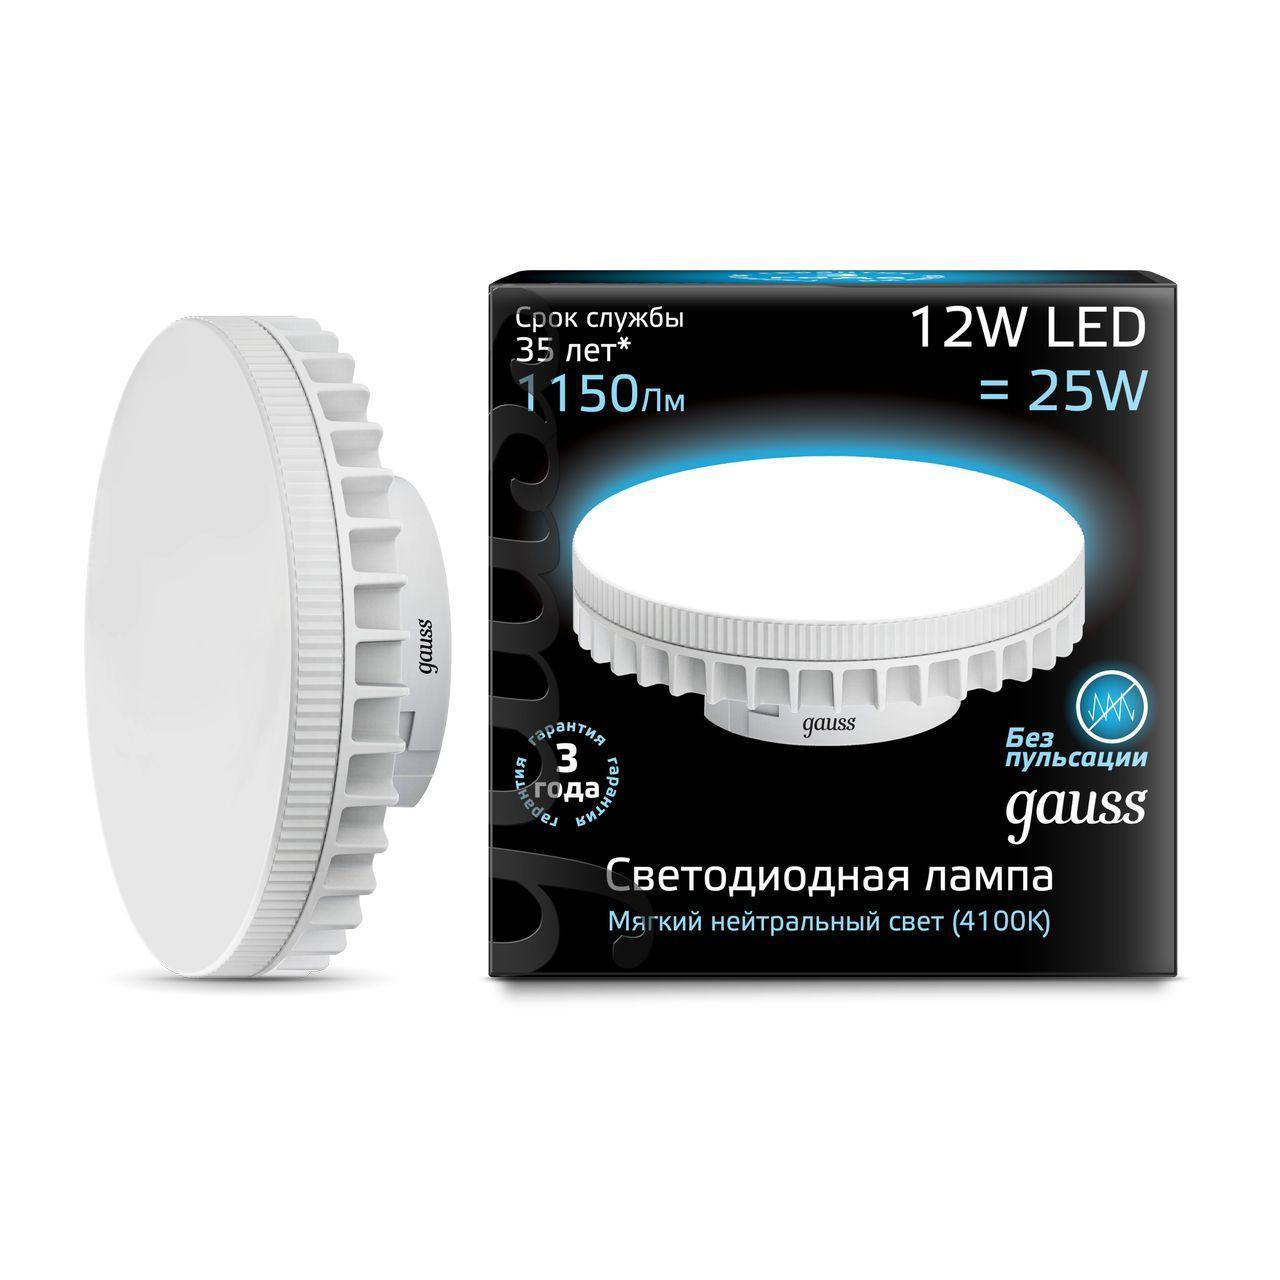 цена на Лампа светодиодная GX70 12W 4100K матовая 131016212